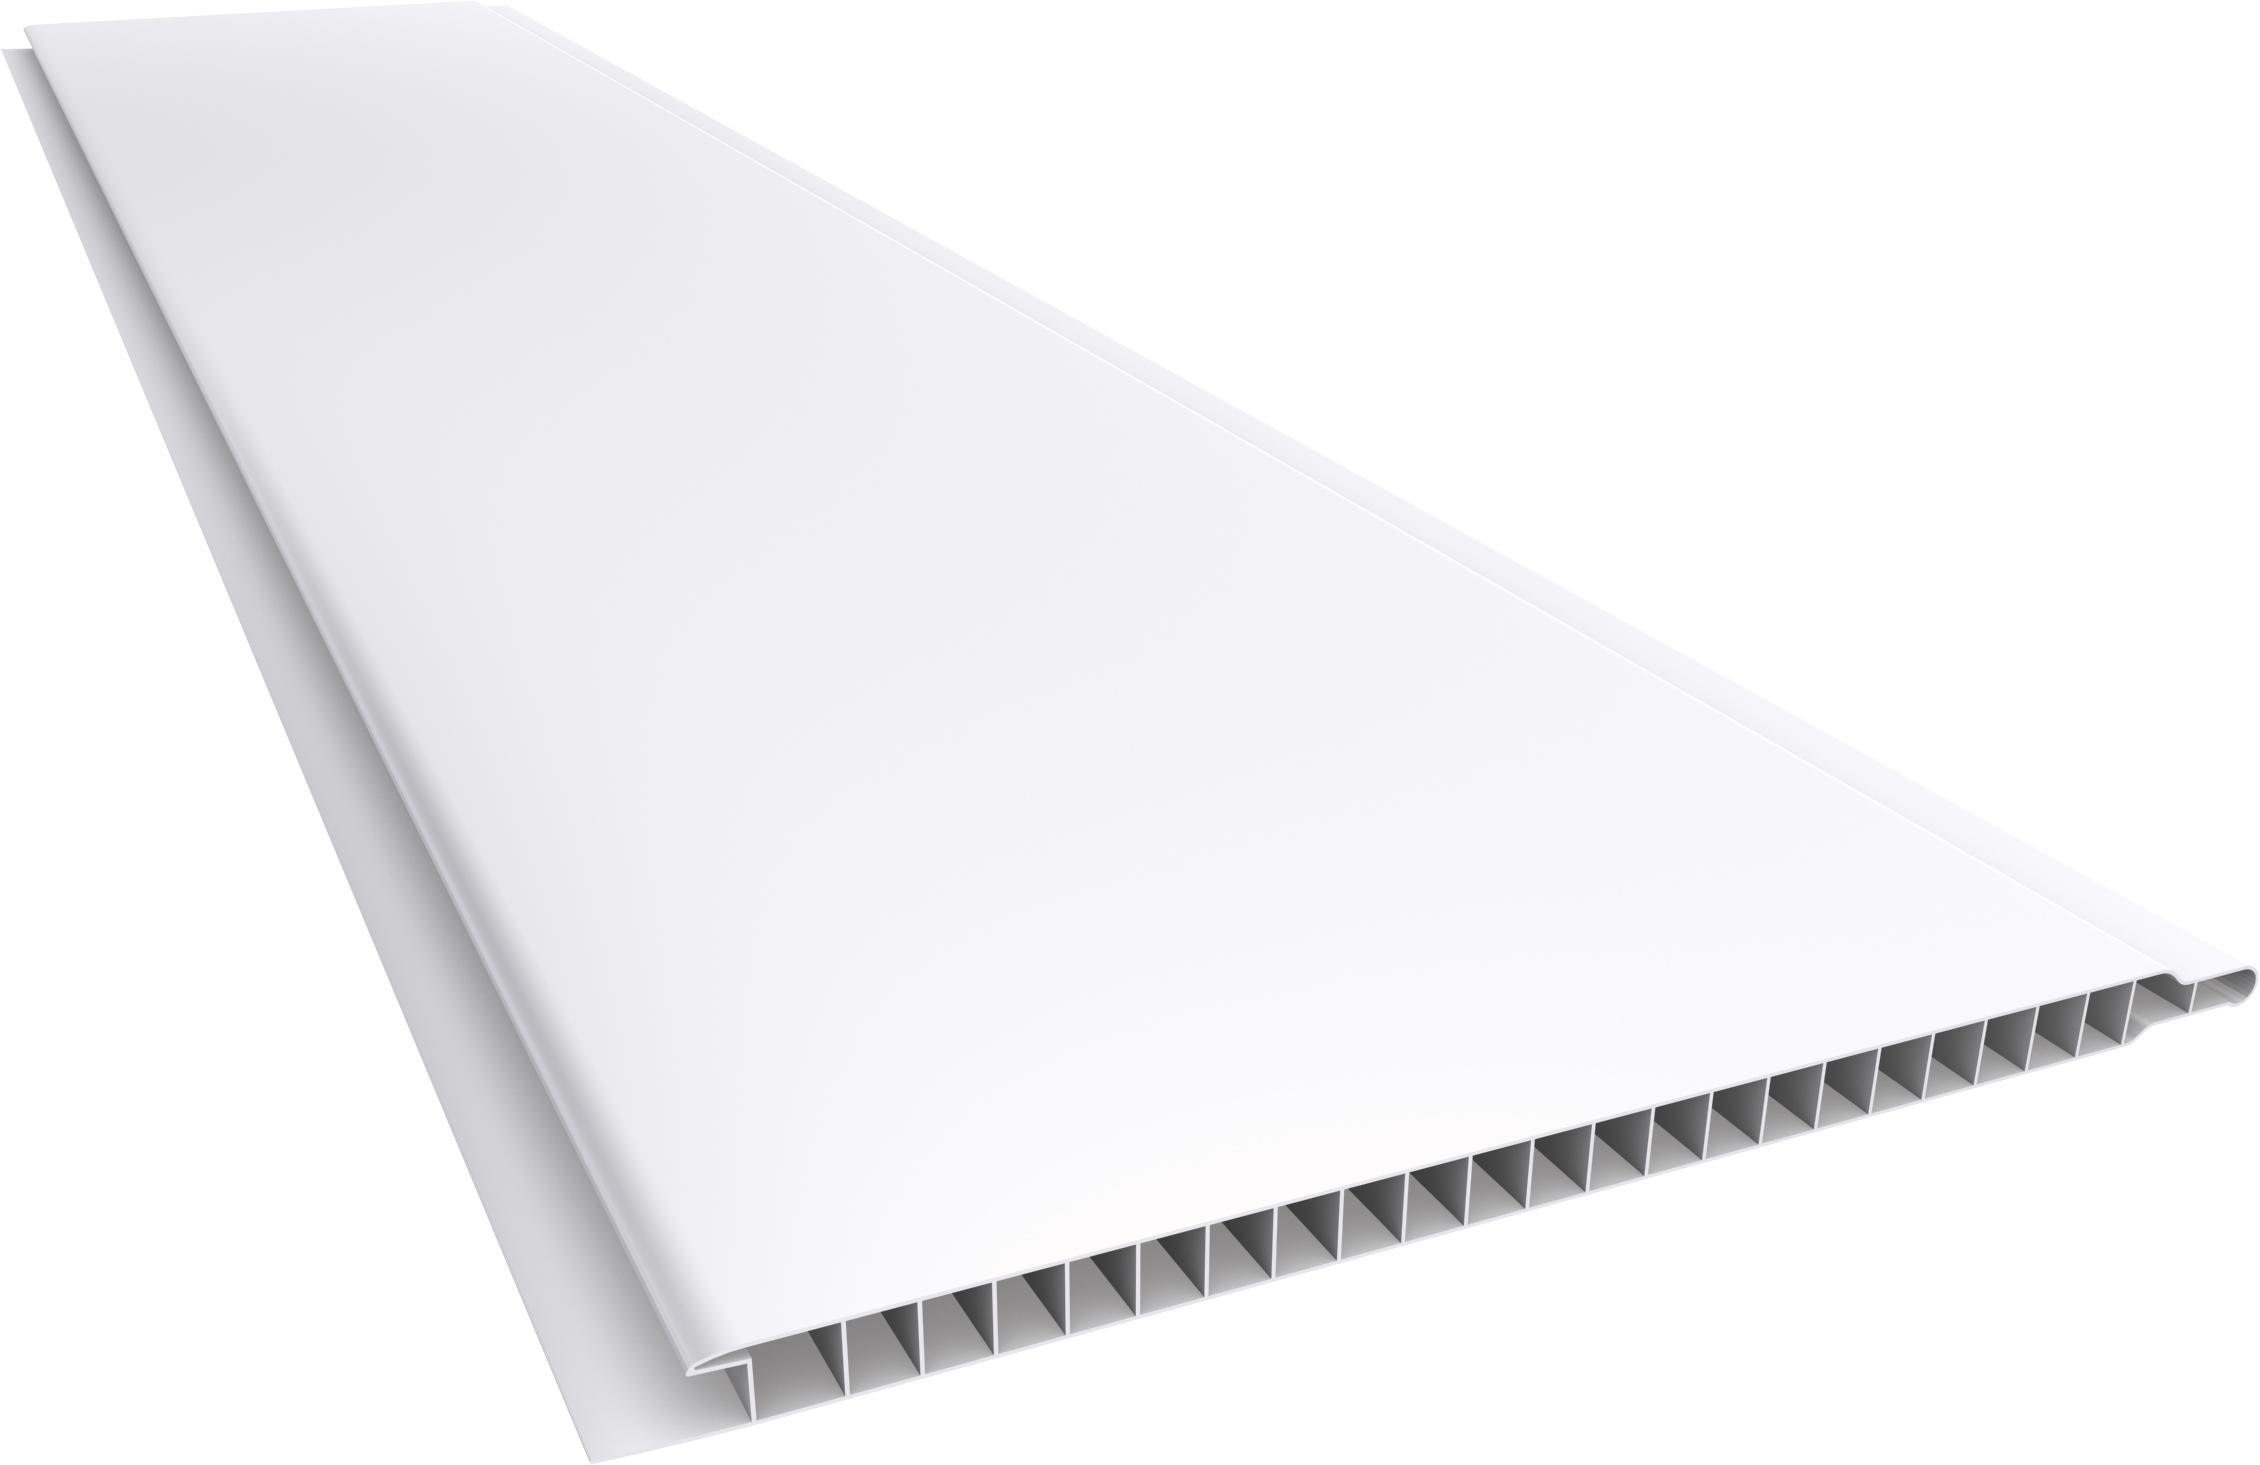 Forro PVC 200 Liso Junta Seca 10mm